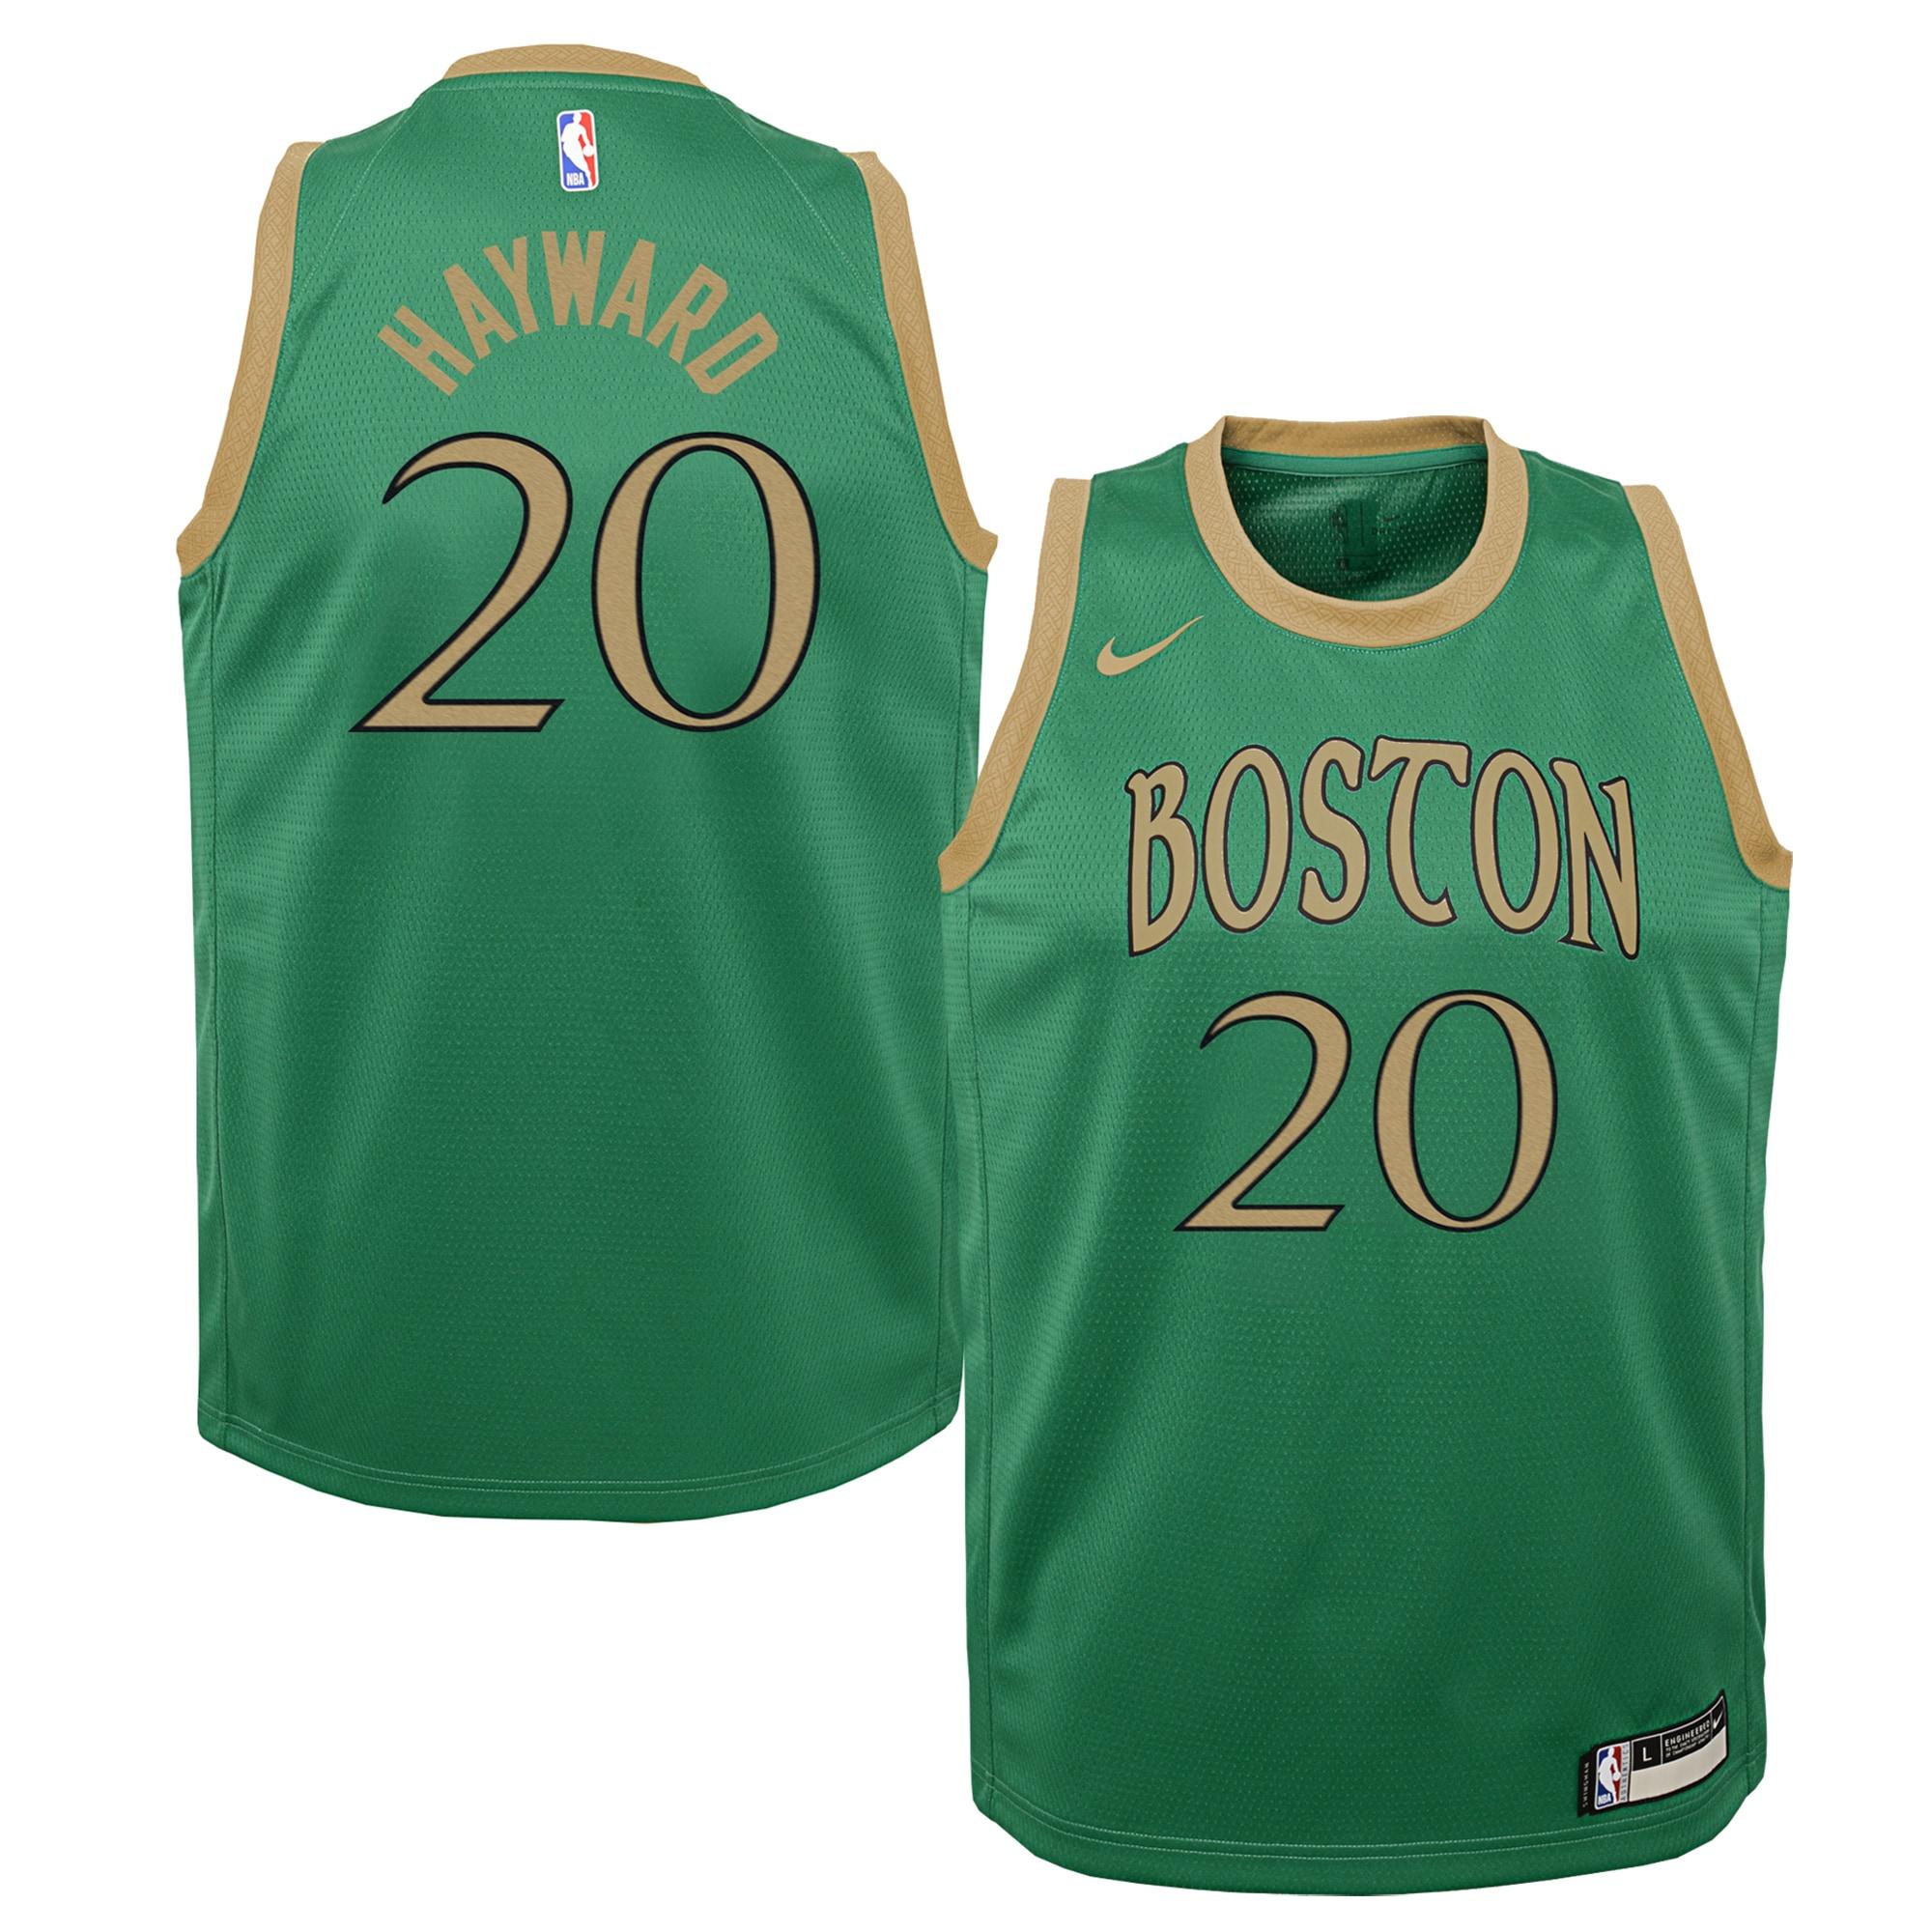 Gordon Hayward Boston Celtics Nike Youth Swingman Jersey Green - City Edition